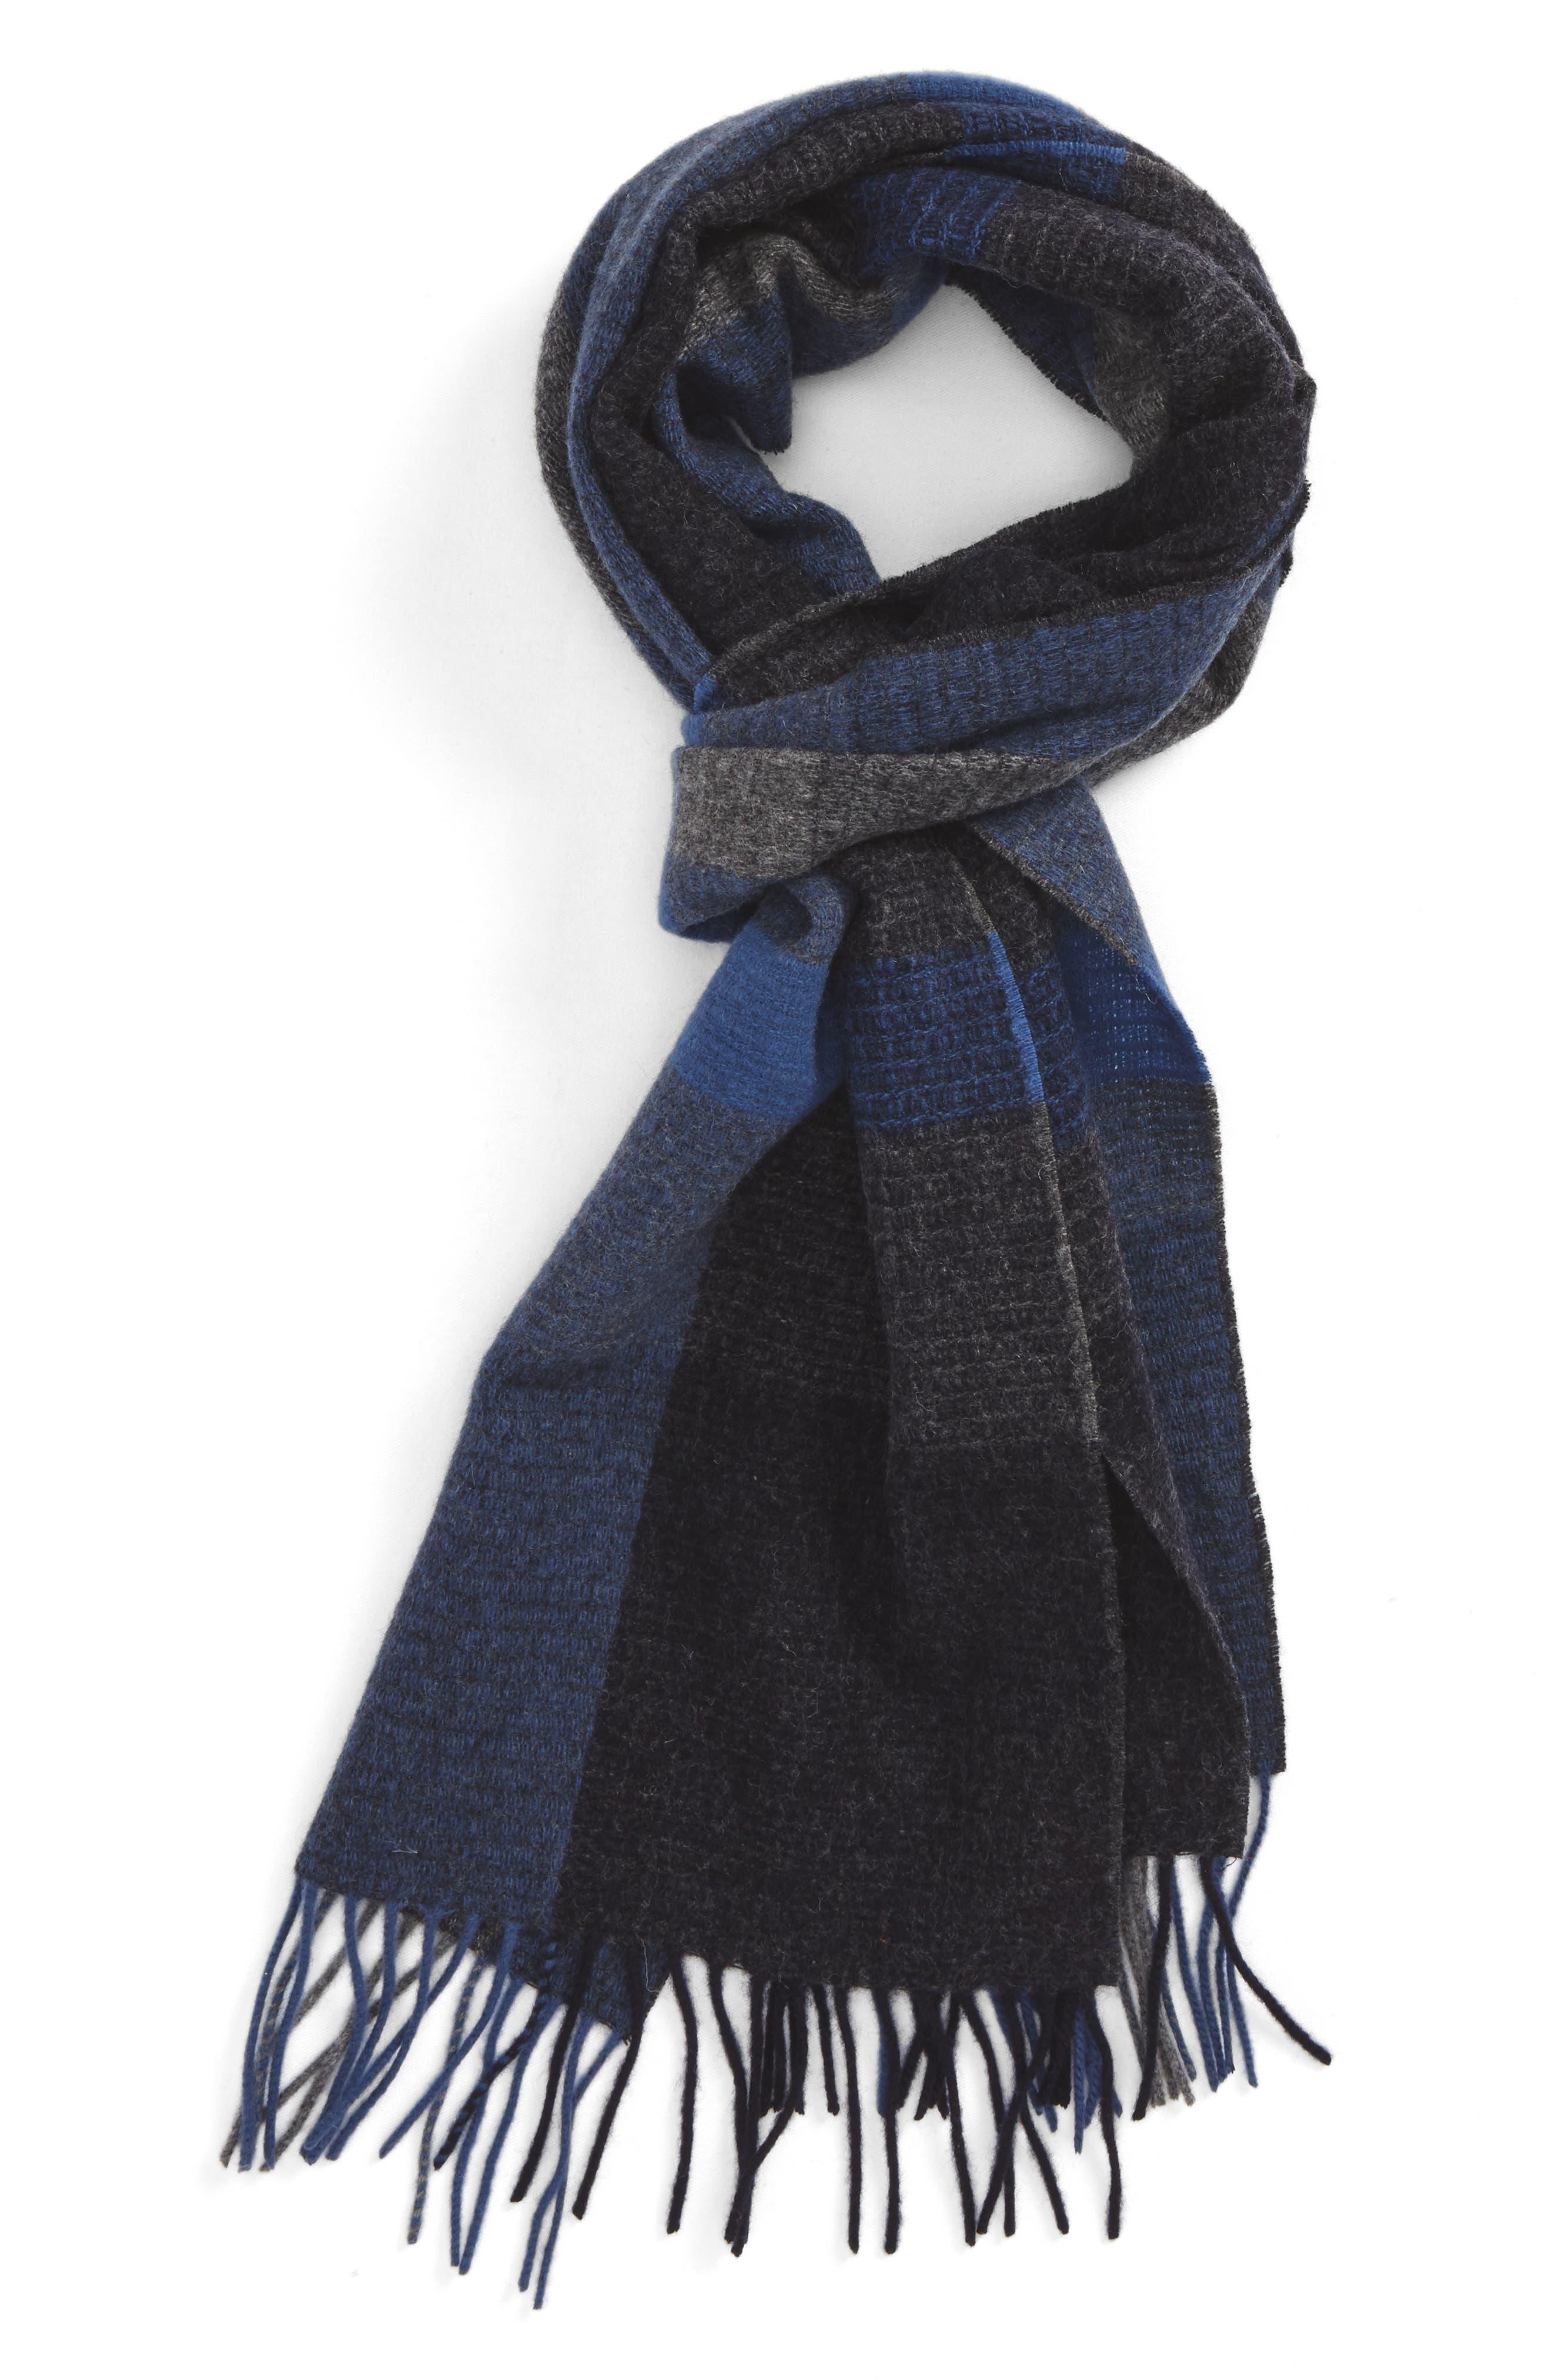 Plaid Wool Scarf,                         Main,                         color, Navy Night - Grey Block Plaid